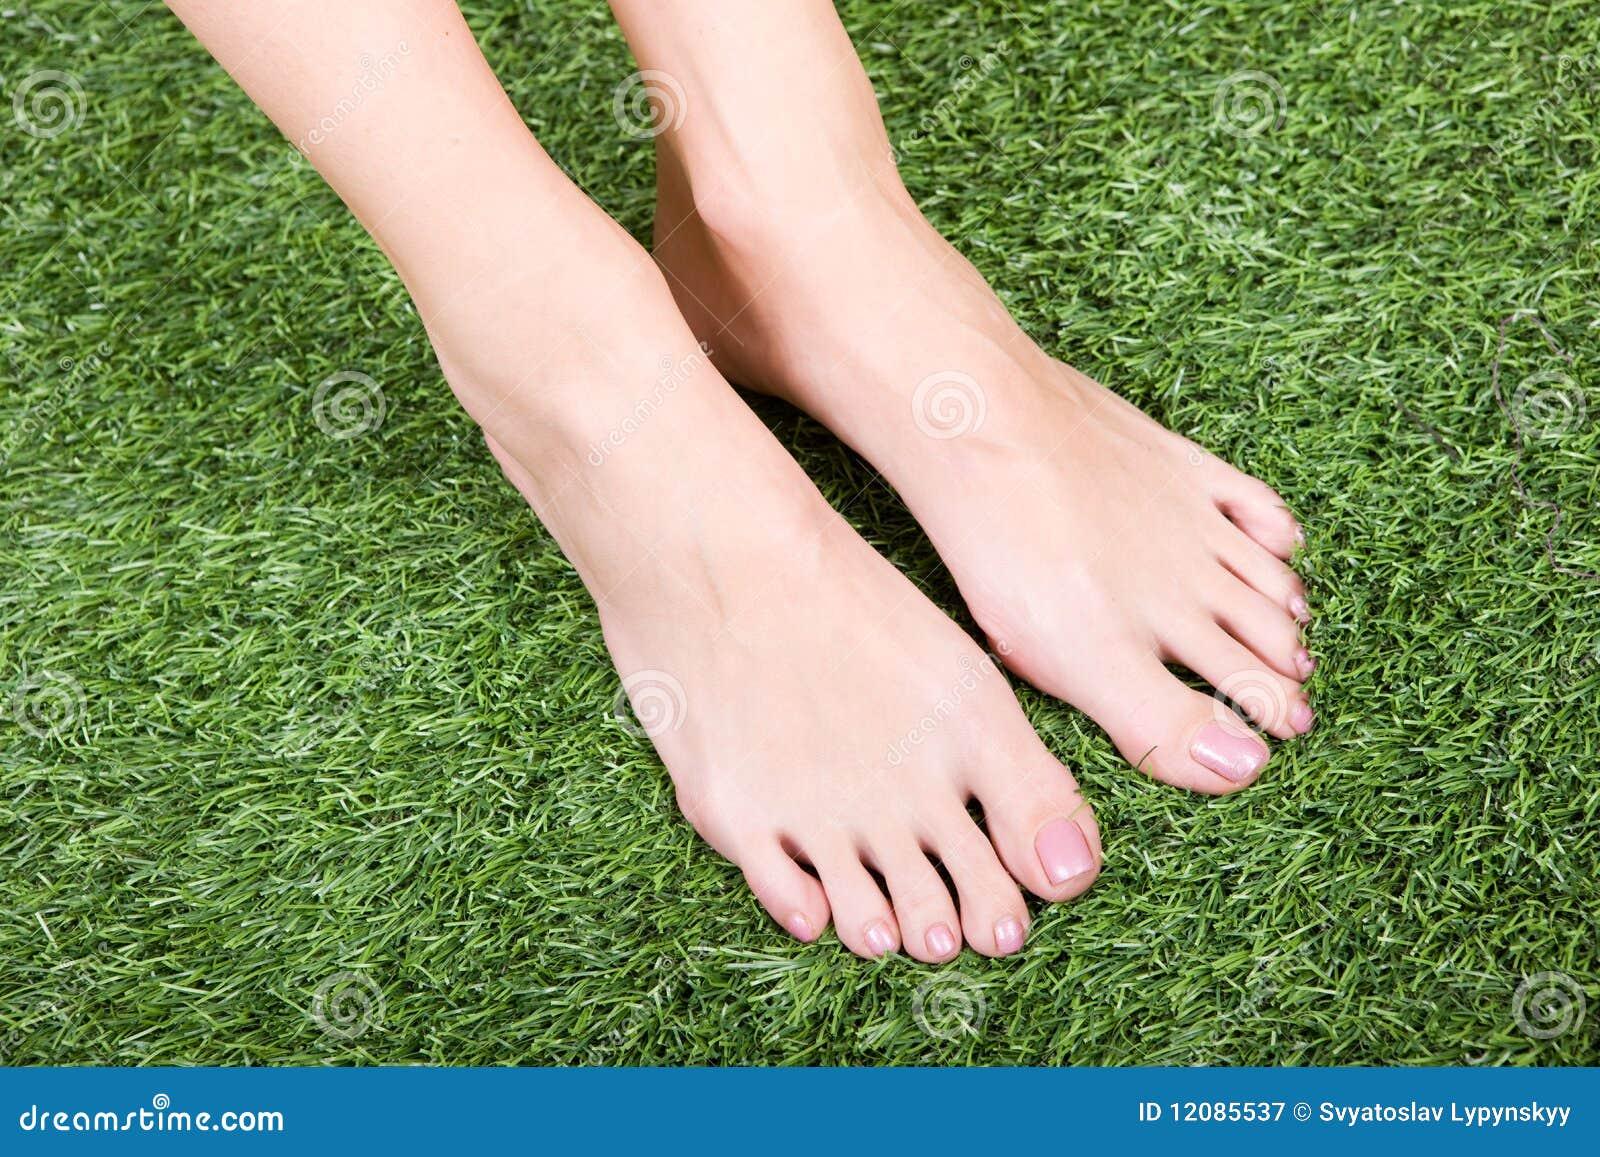 beautiful slim female feet on green grass stock image - image of